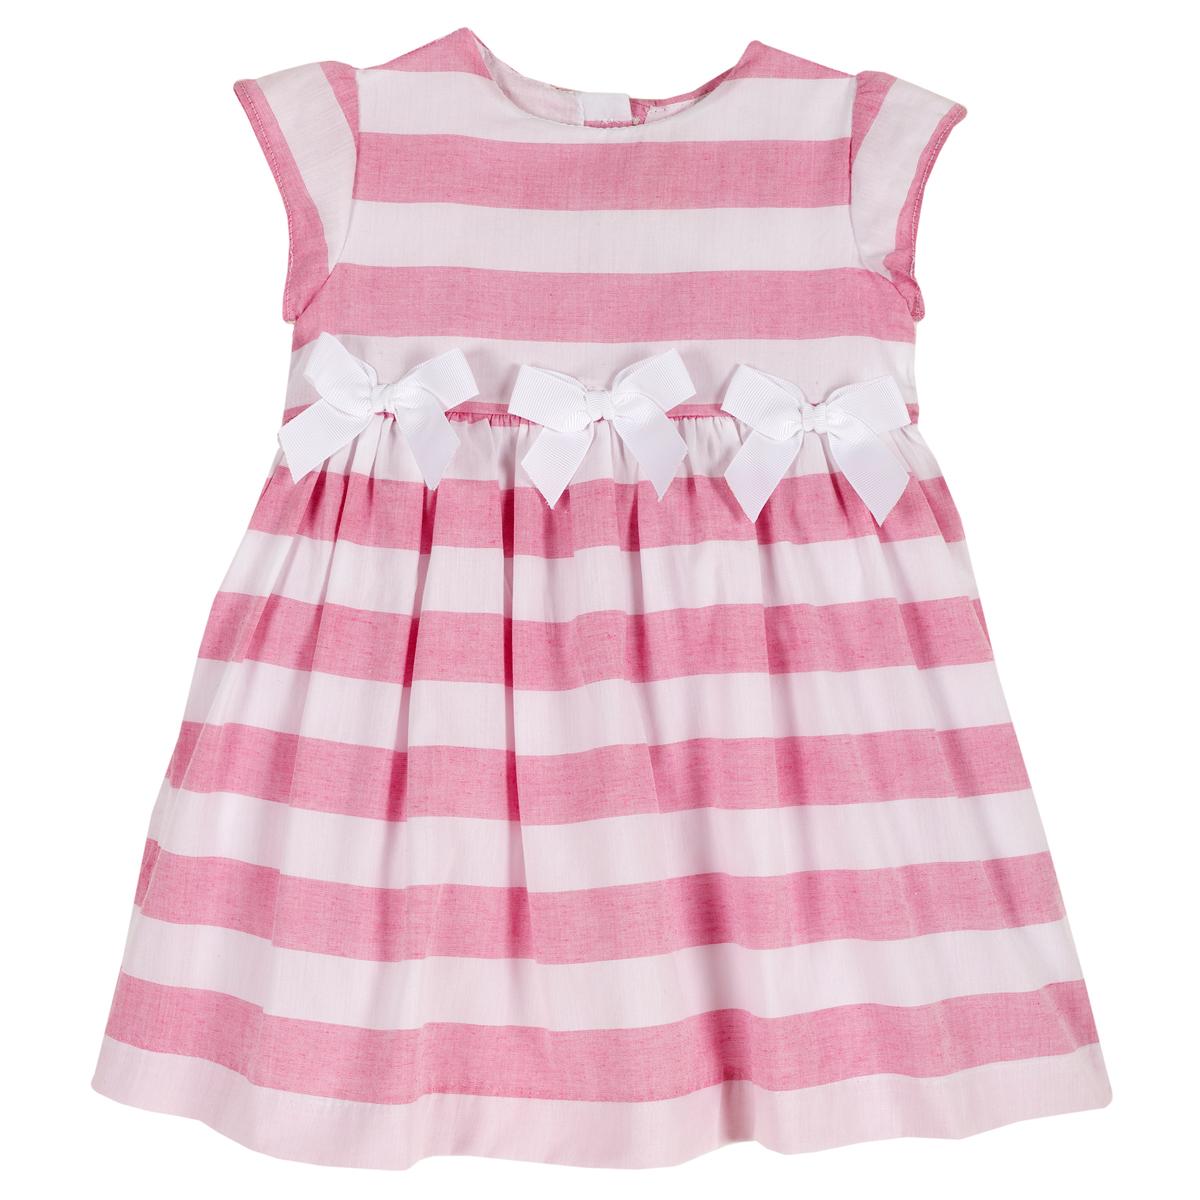 Rochita cu dublura Chicco, maneca scurta, roz, 03432